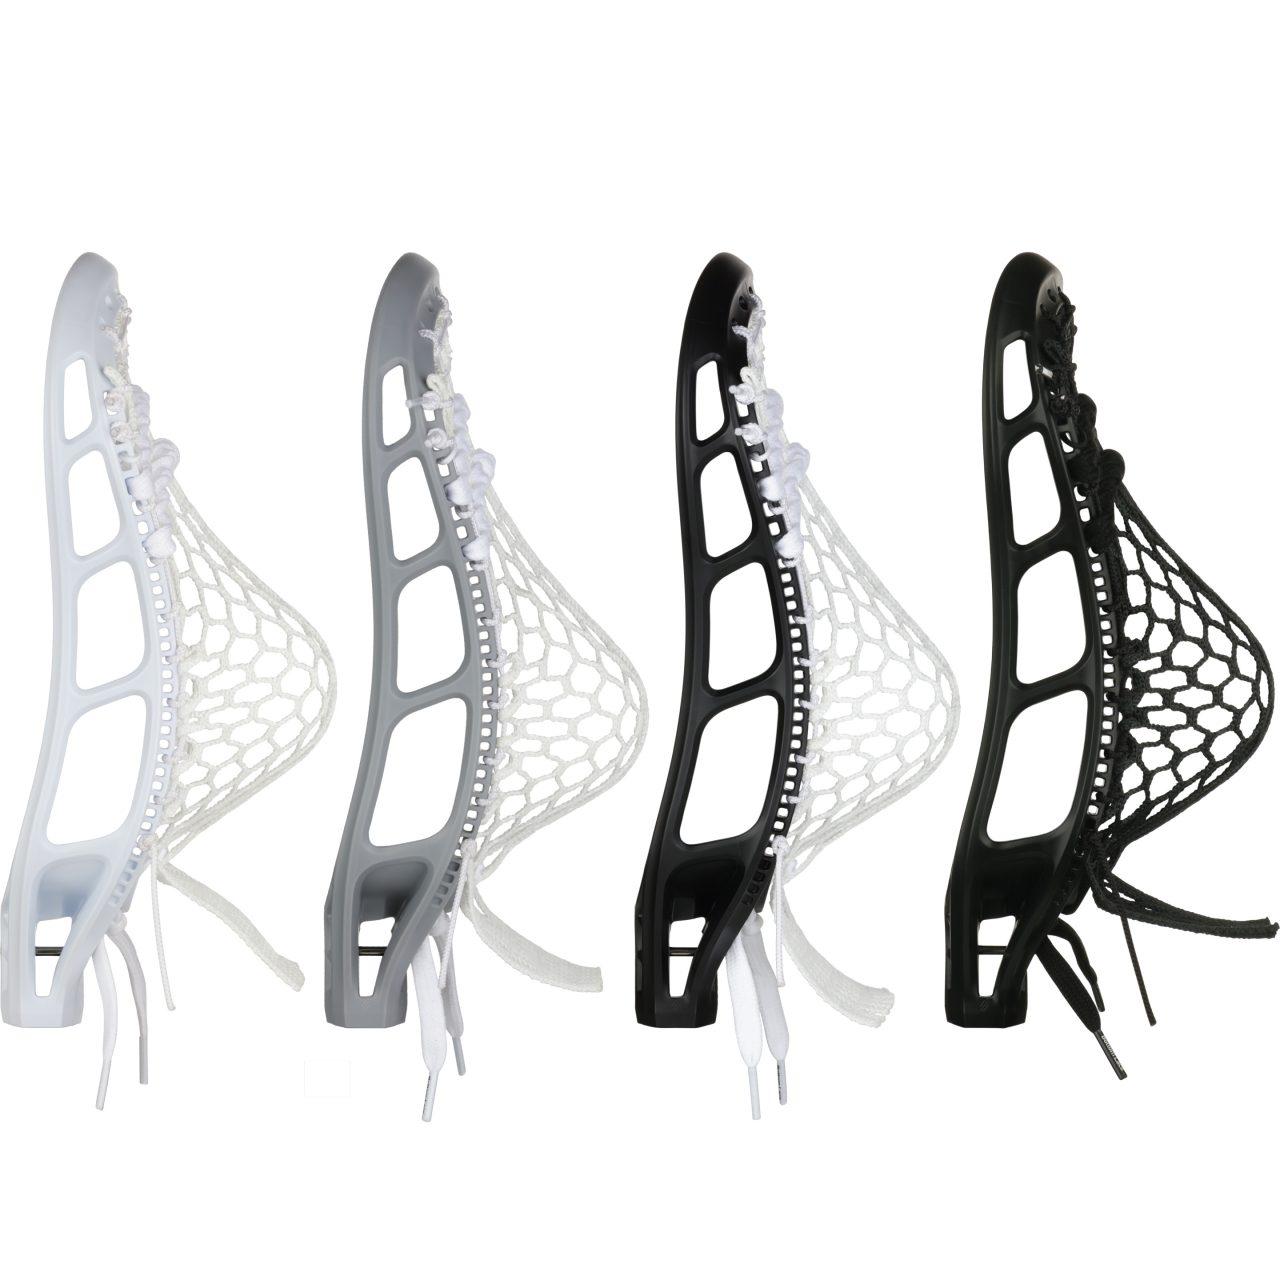 StringKing Mark 2A Attack Lacrosse Head Strung Pocket Color Options